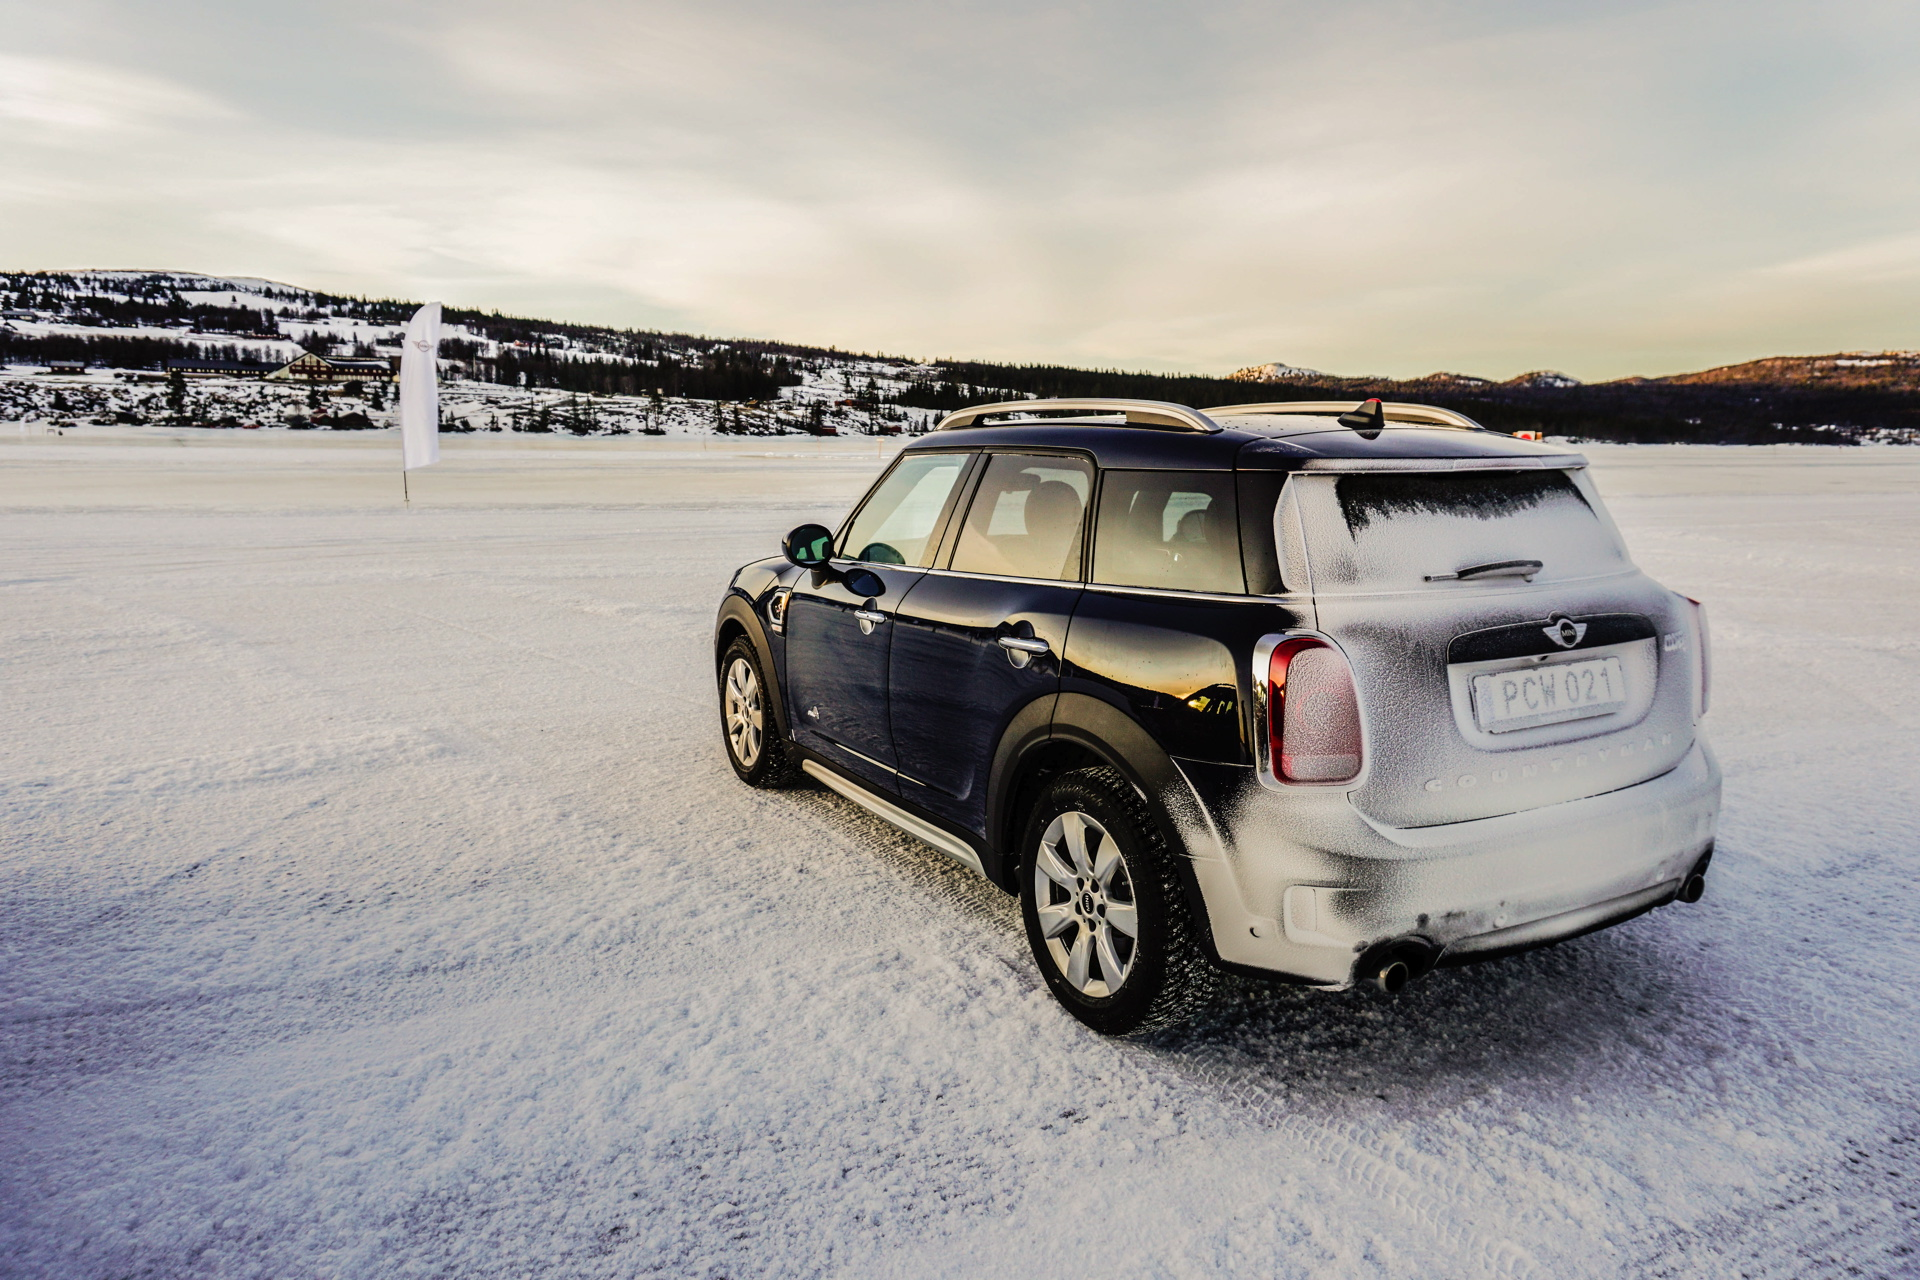 2017 MINI Countryman test drive 09